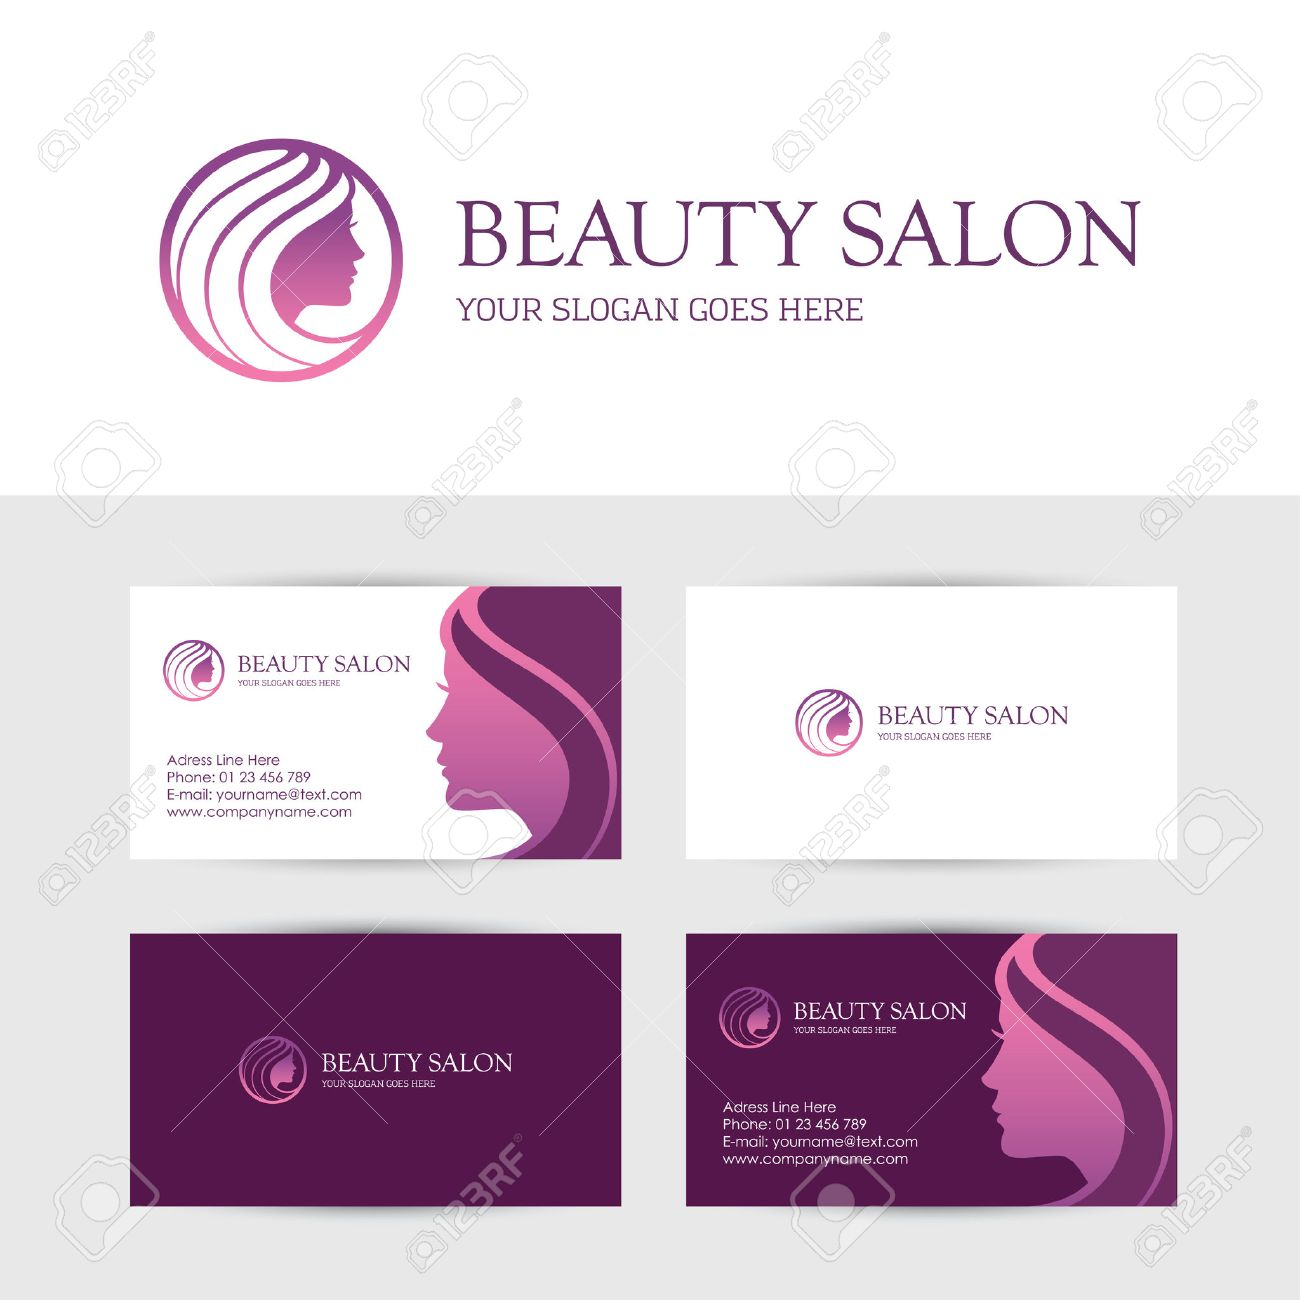 Salon Business Plan Template Executive Summary Of A Business Plan - Hair salon business plan template